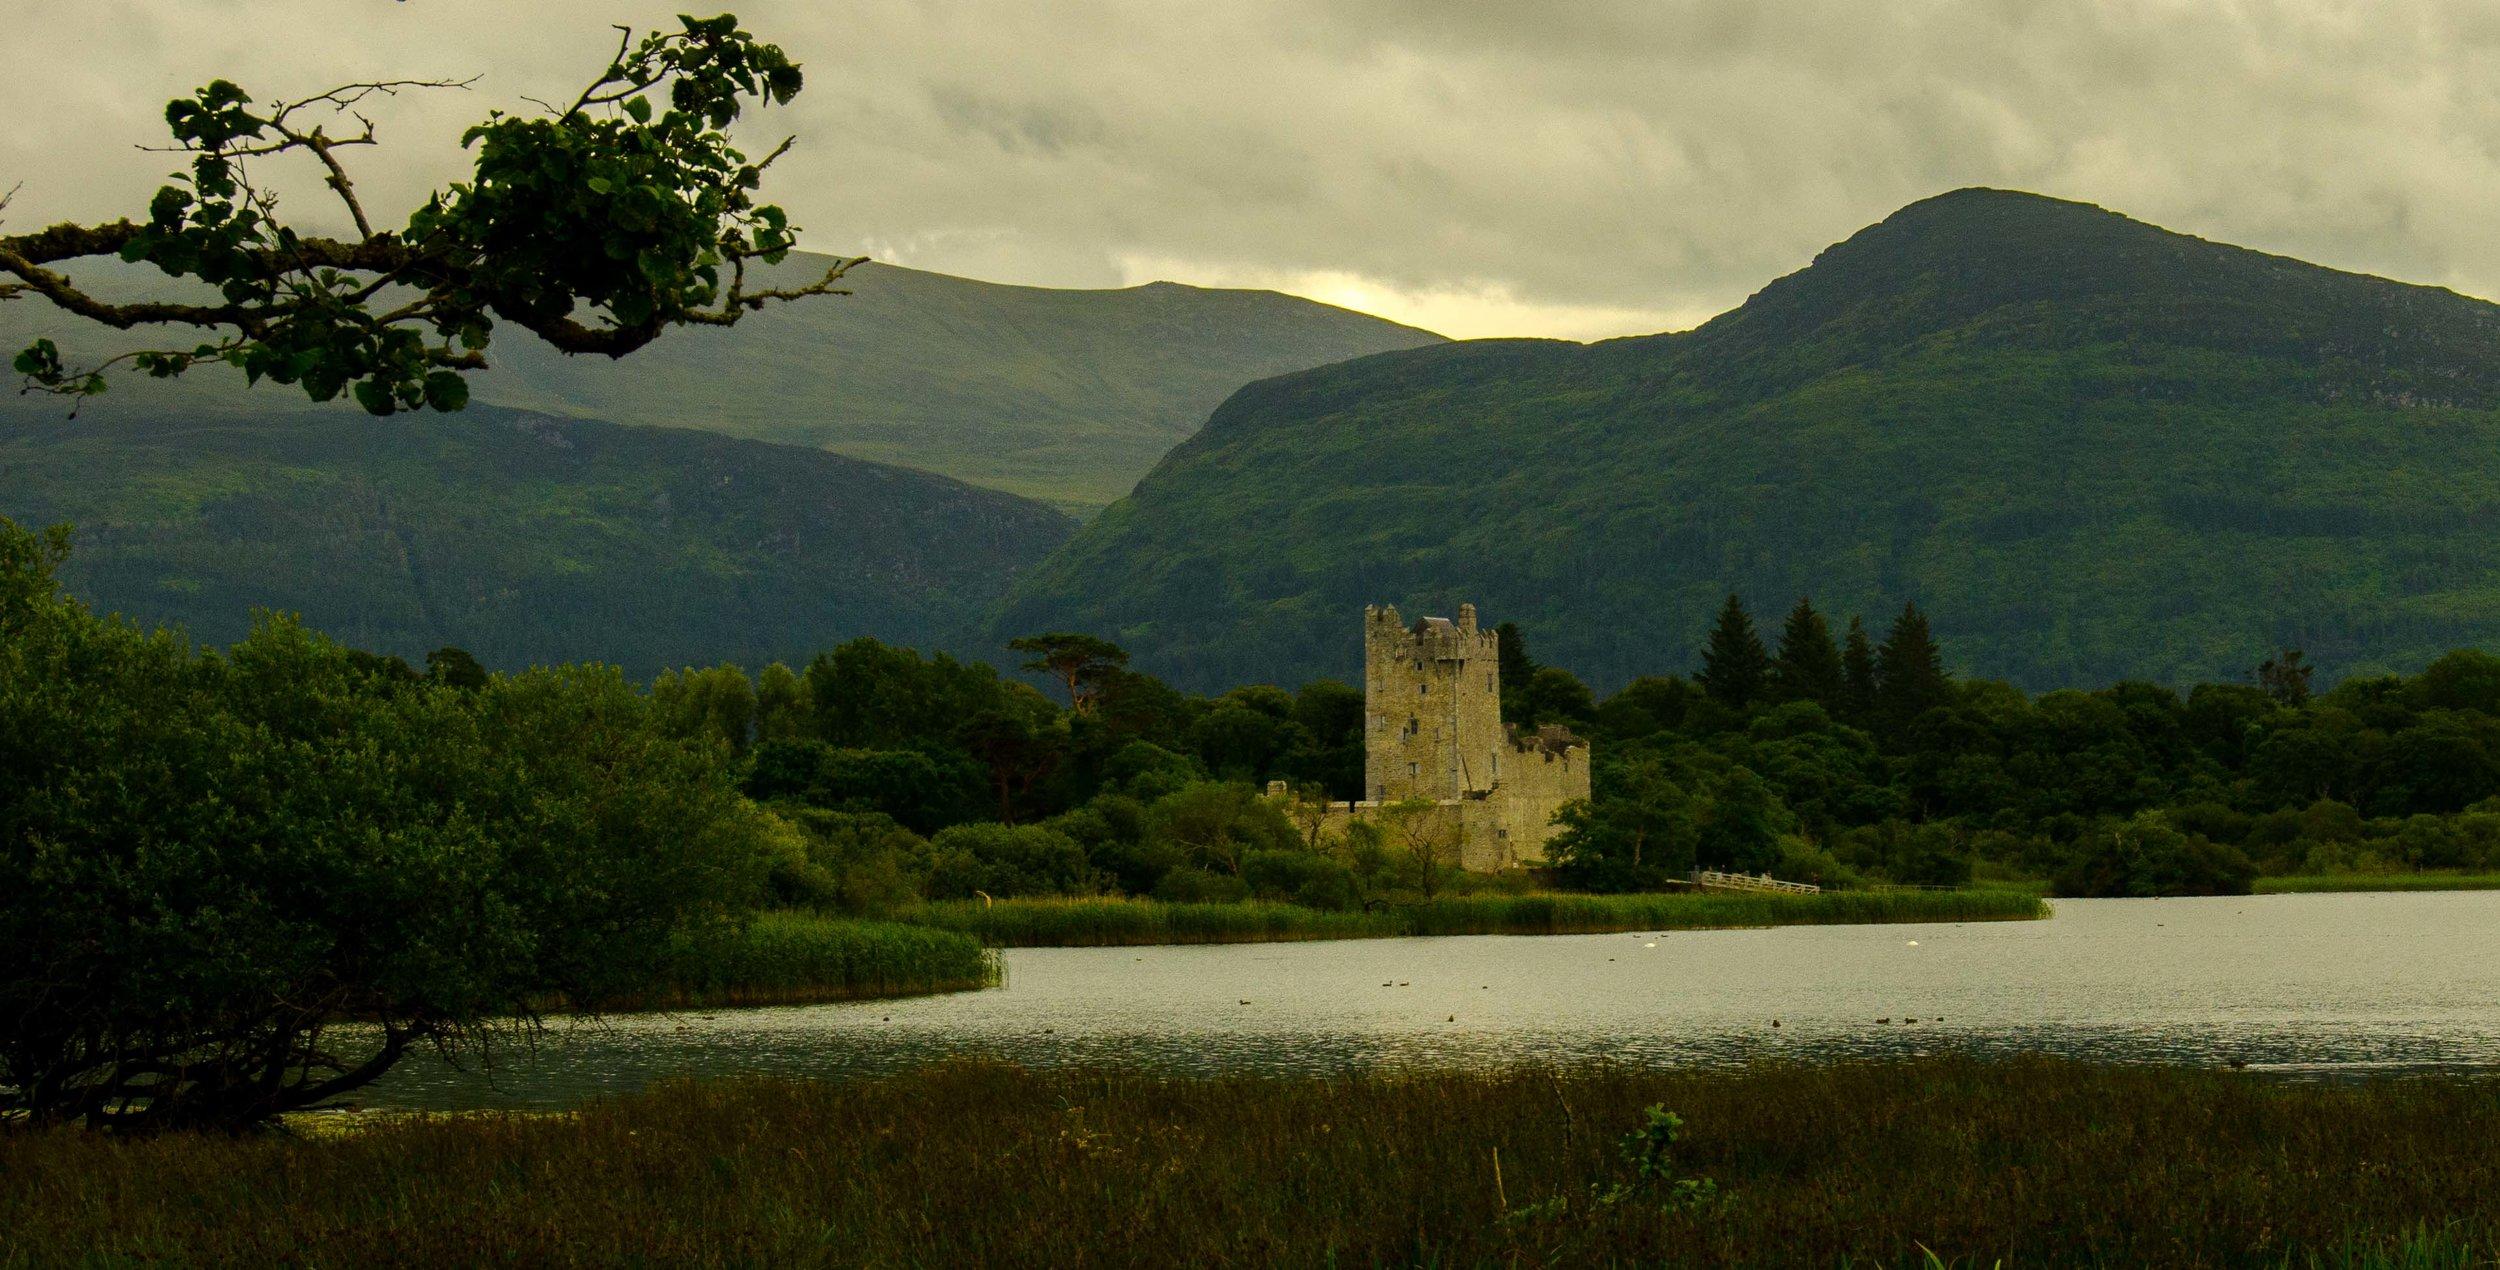 Ross Castle. Killarney, Ireland 2015